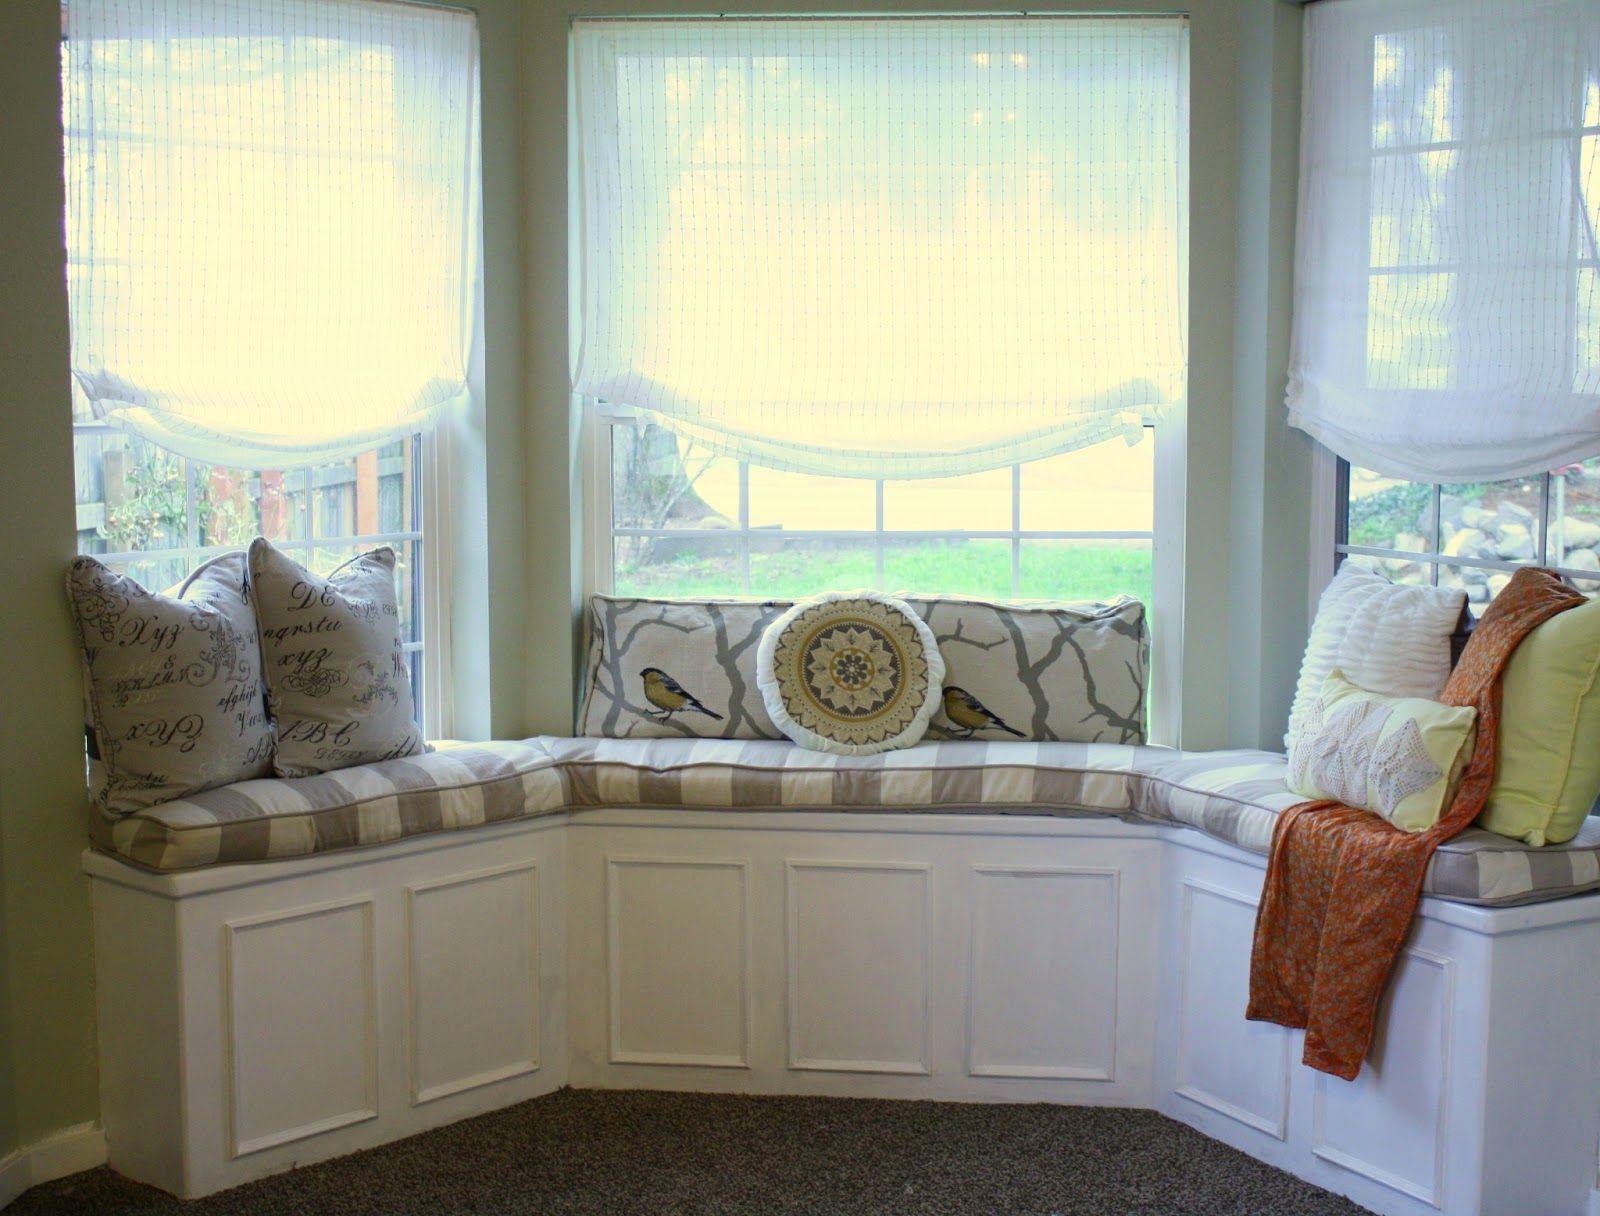 Bay Window Design Creativity  Window Minimalist And Bay Windows Classy Living Room Bay Window Designs Decorating Inspiration